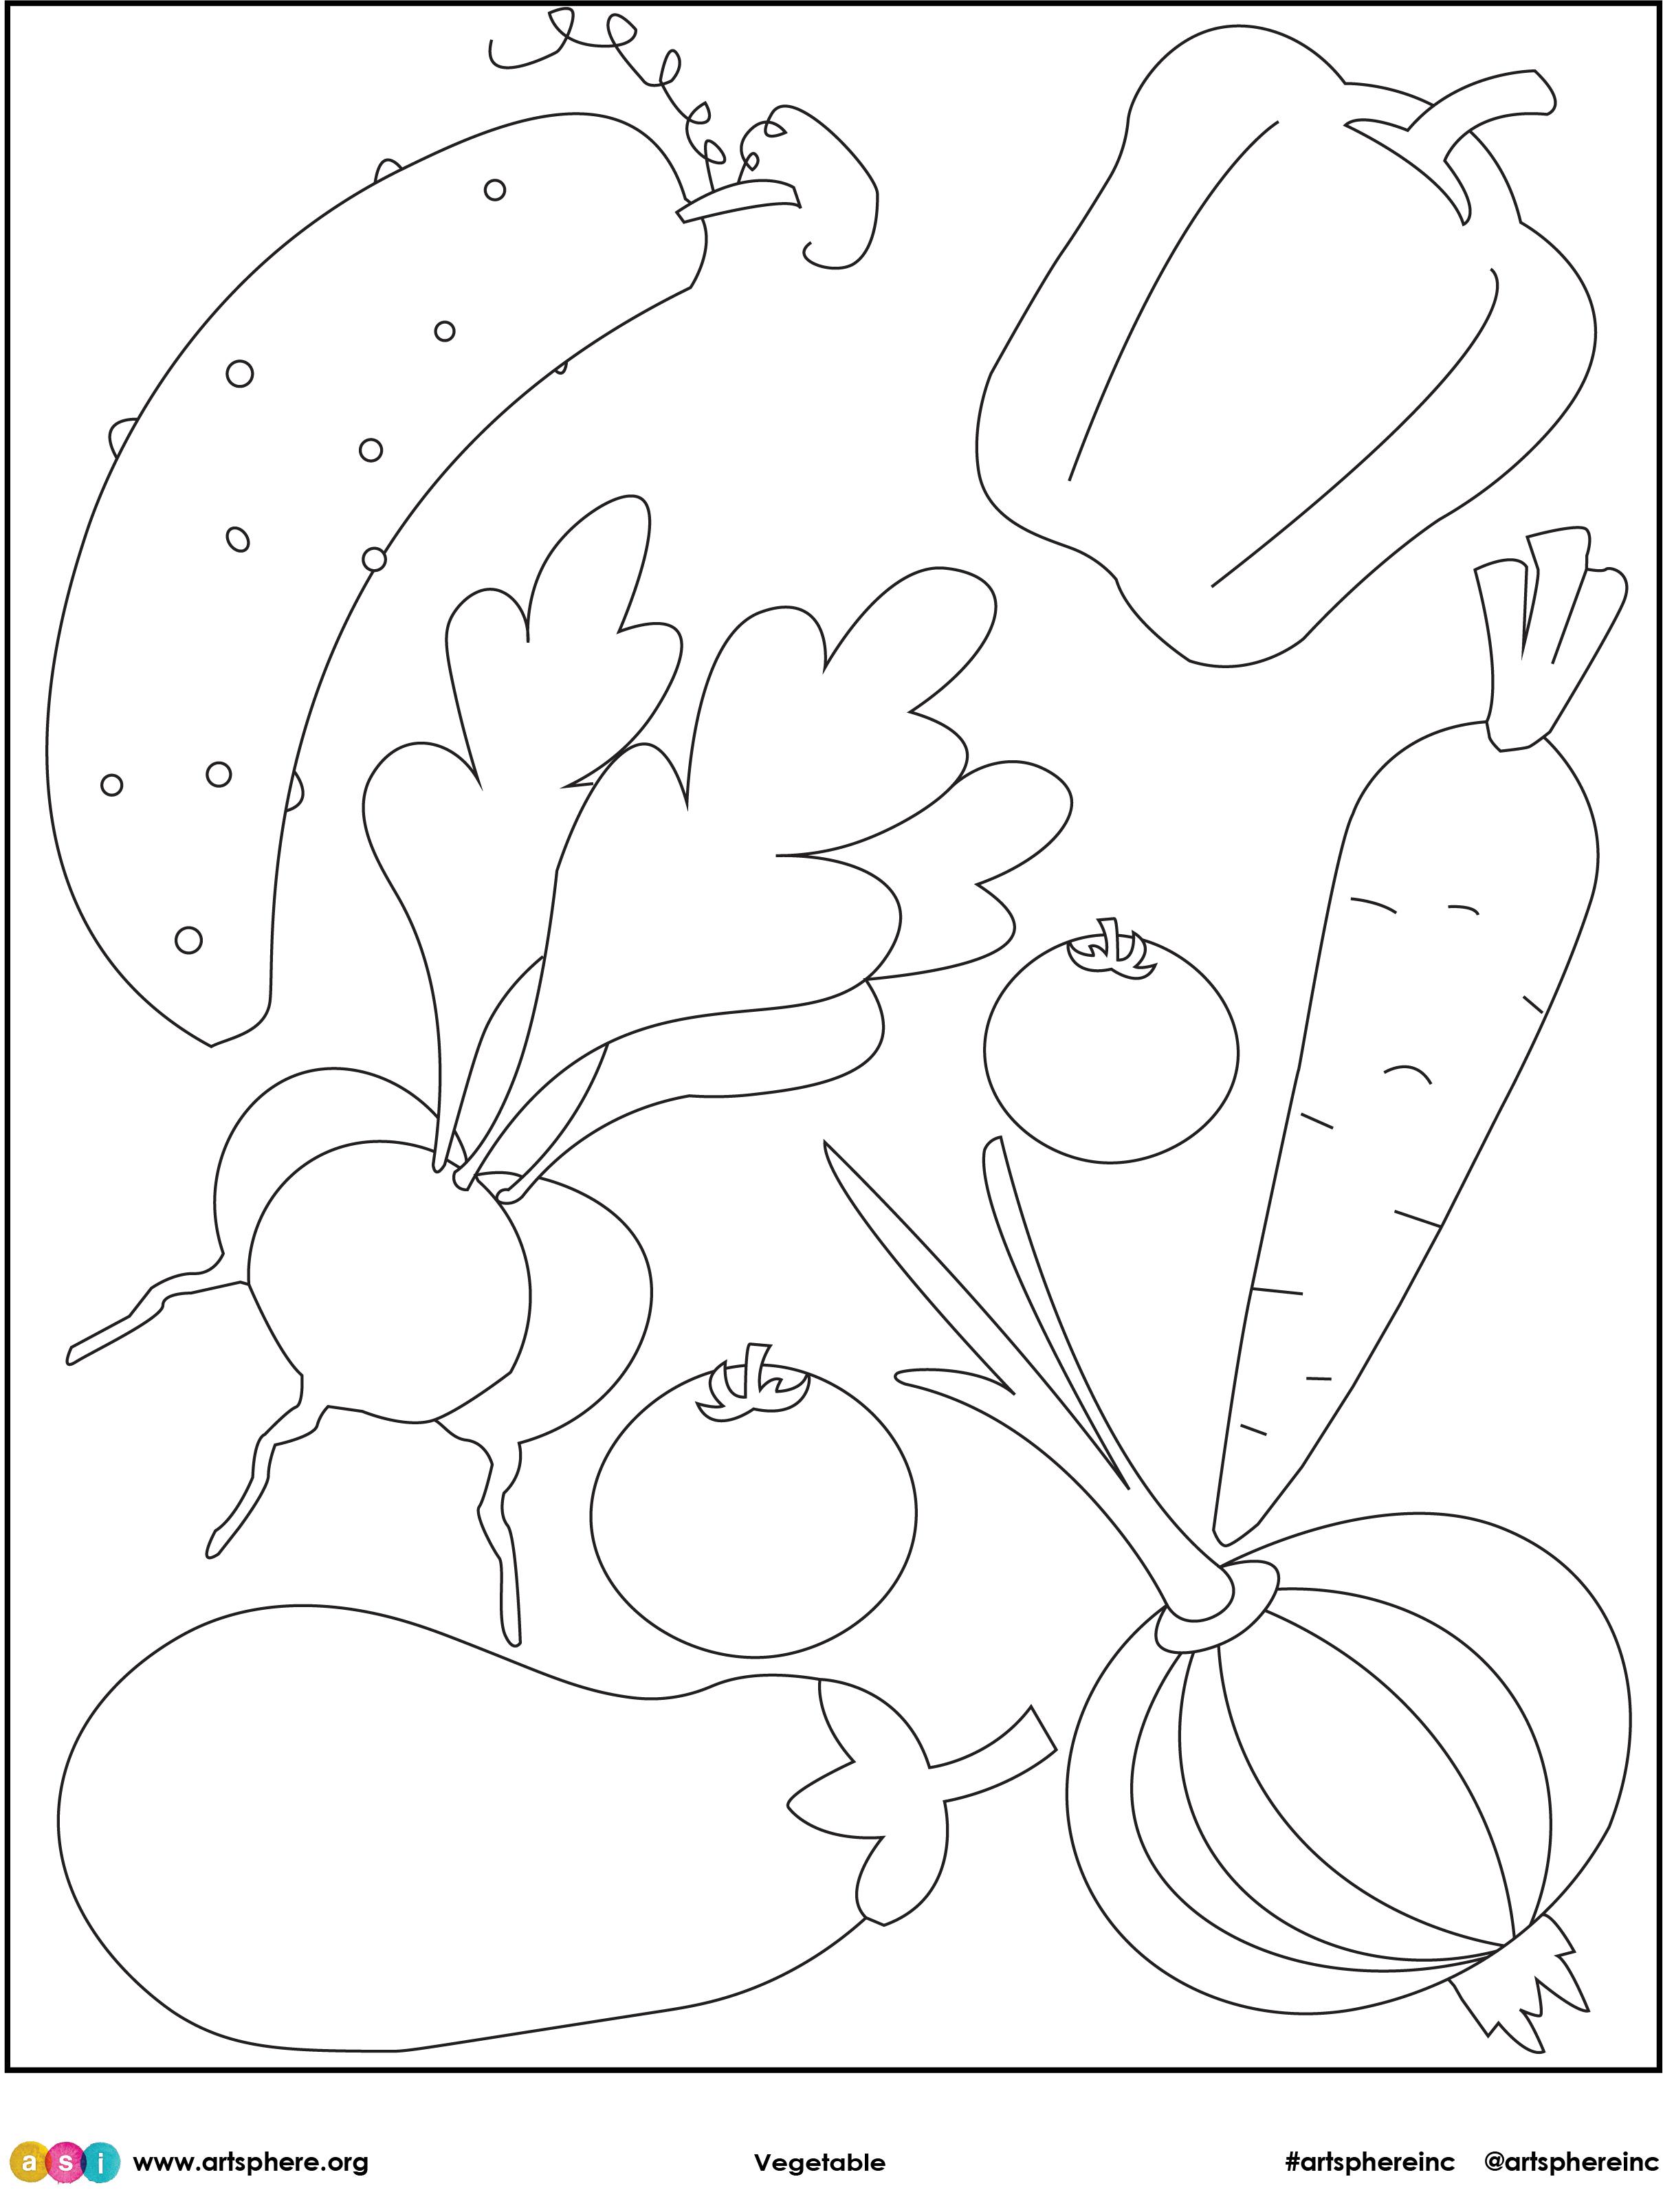 Free Lesson Plan: Vegetable Handout